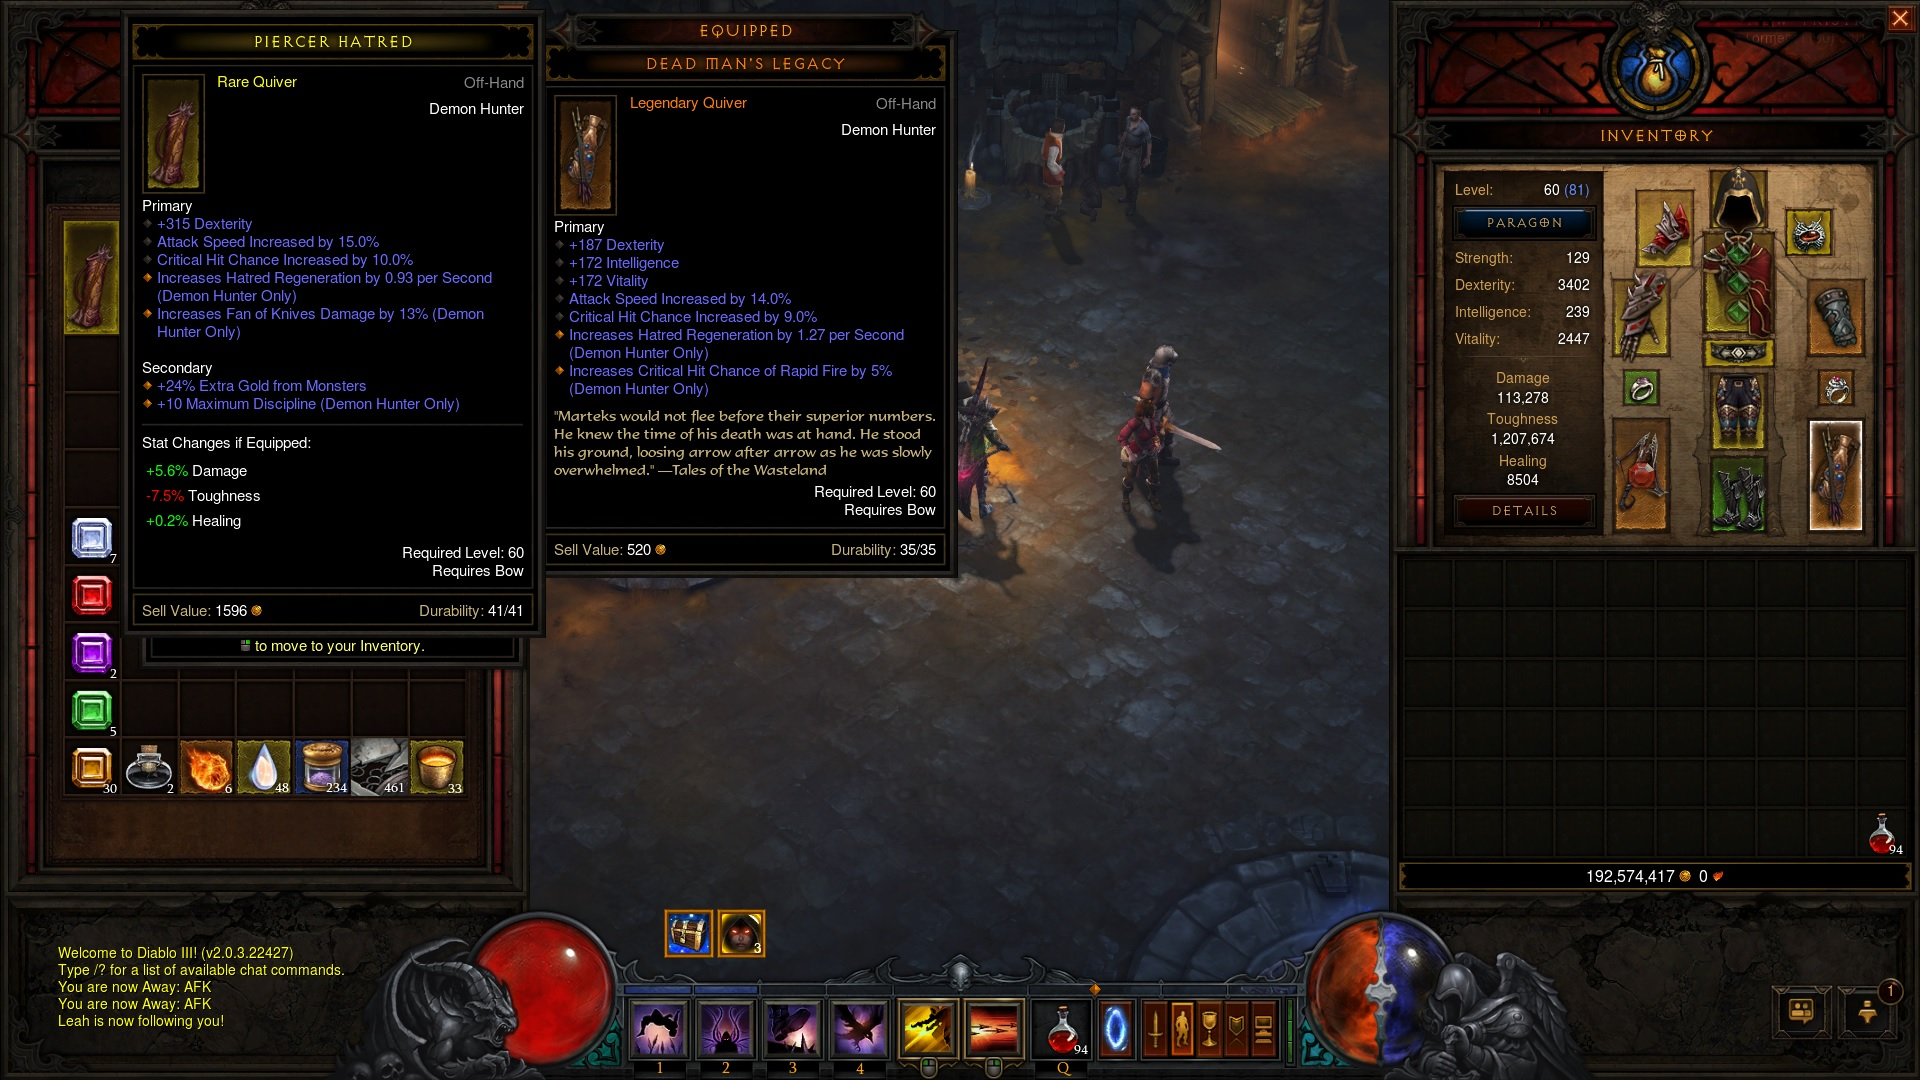 arximiro games that confirmation brevik joining team seen reaper souls hadnt diablo